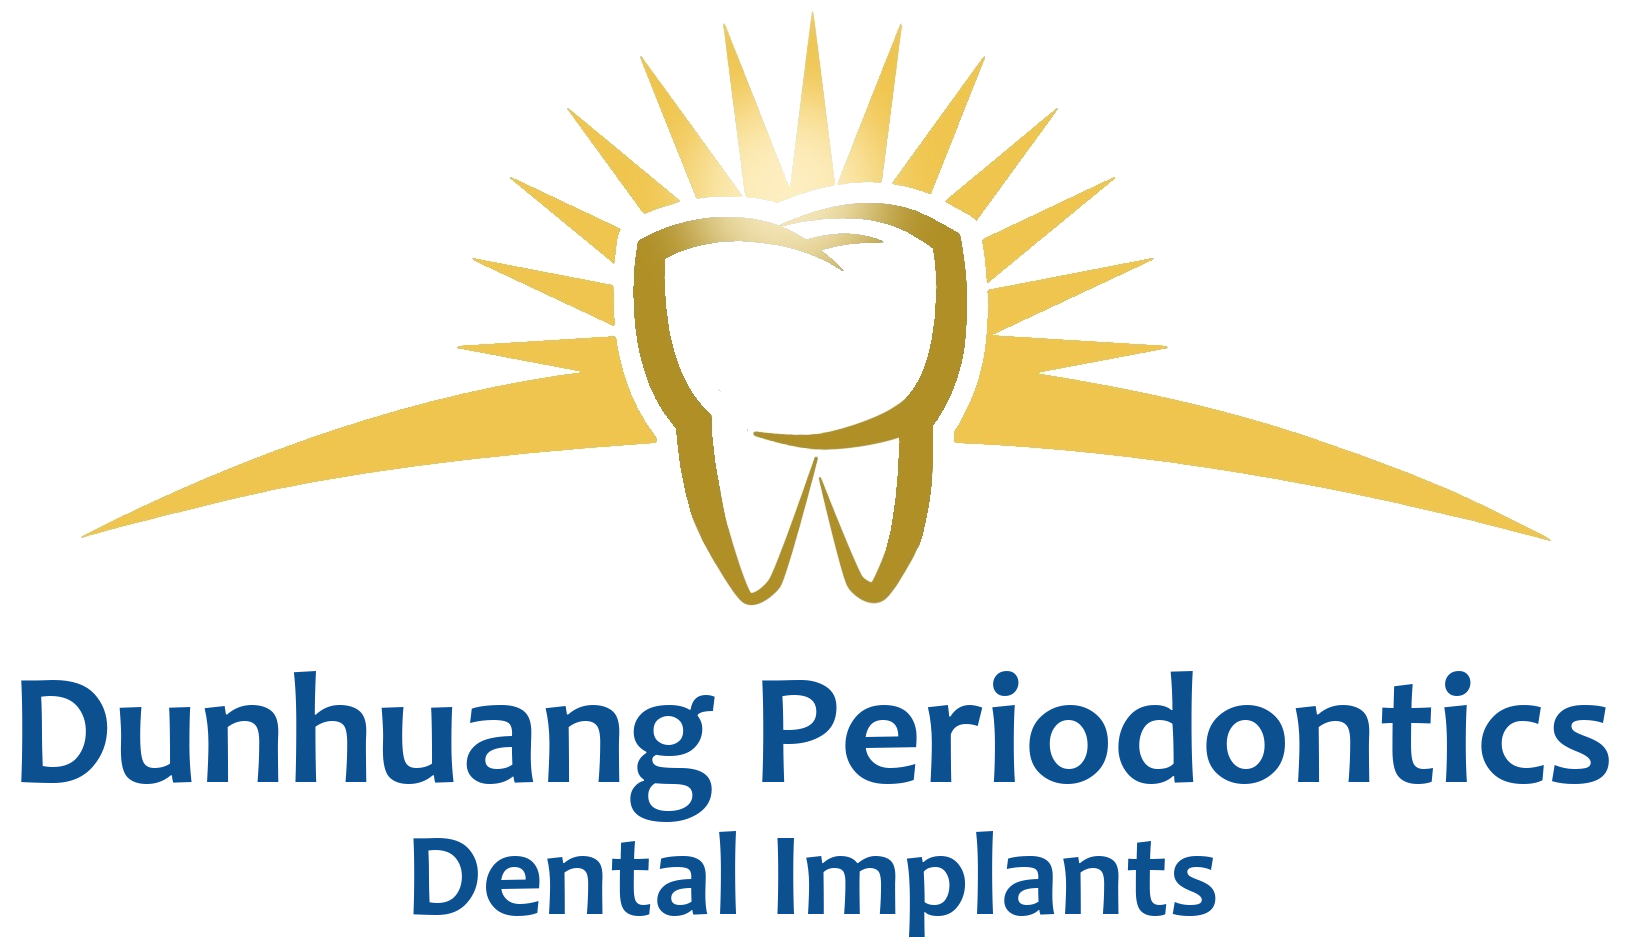 Dunhuang Periodontics Logo